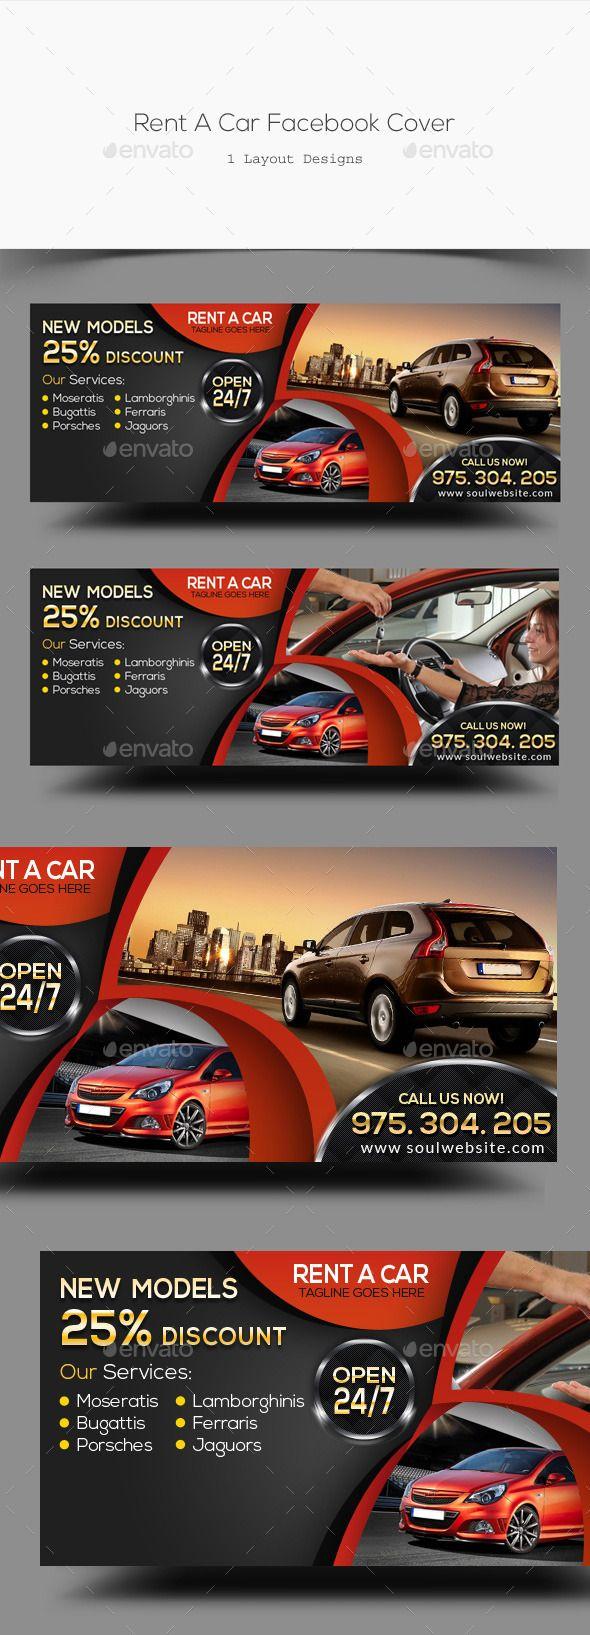 Rent A Car Facebook Cover Template #design #psd Download: http://graphicriver.net/item/rent-a-car-facebook-cover/12776742?ref=ksioks